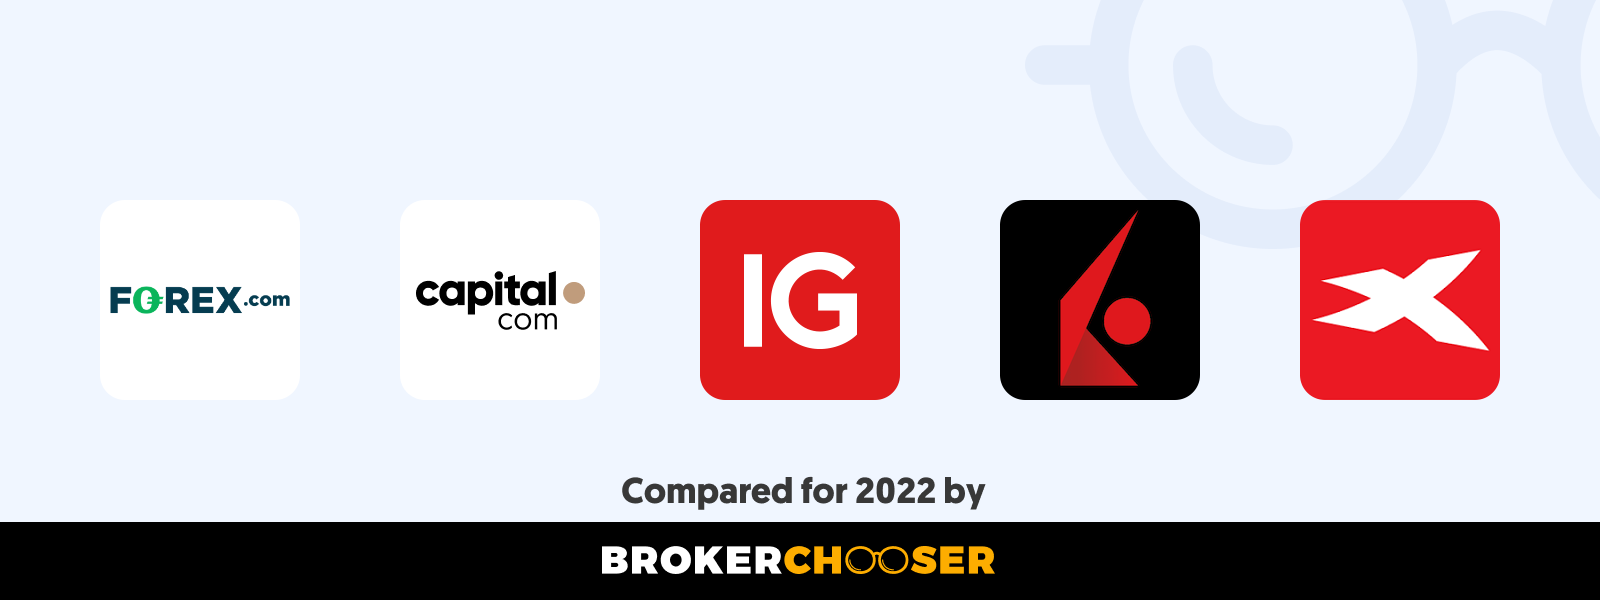 Best forex brokers for beginners in Uganda in 2021